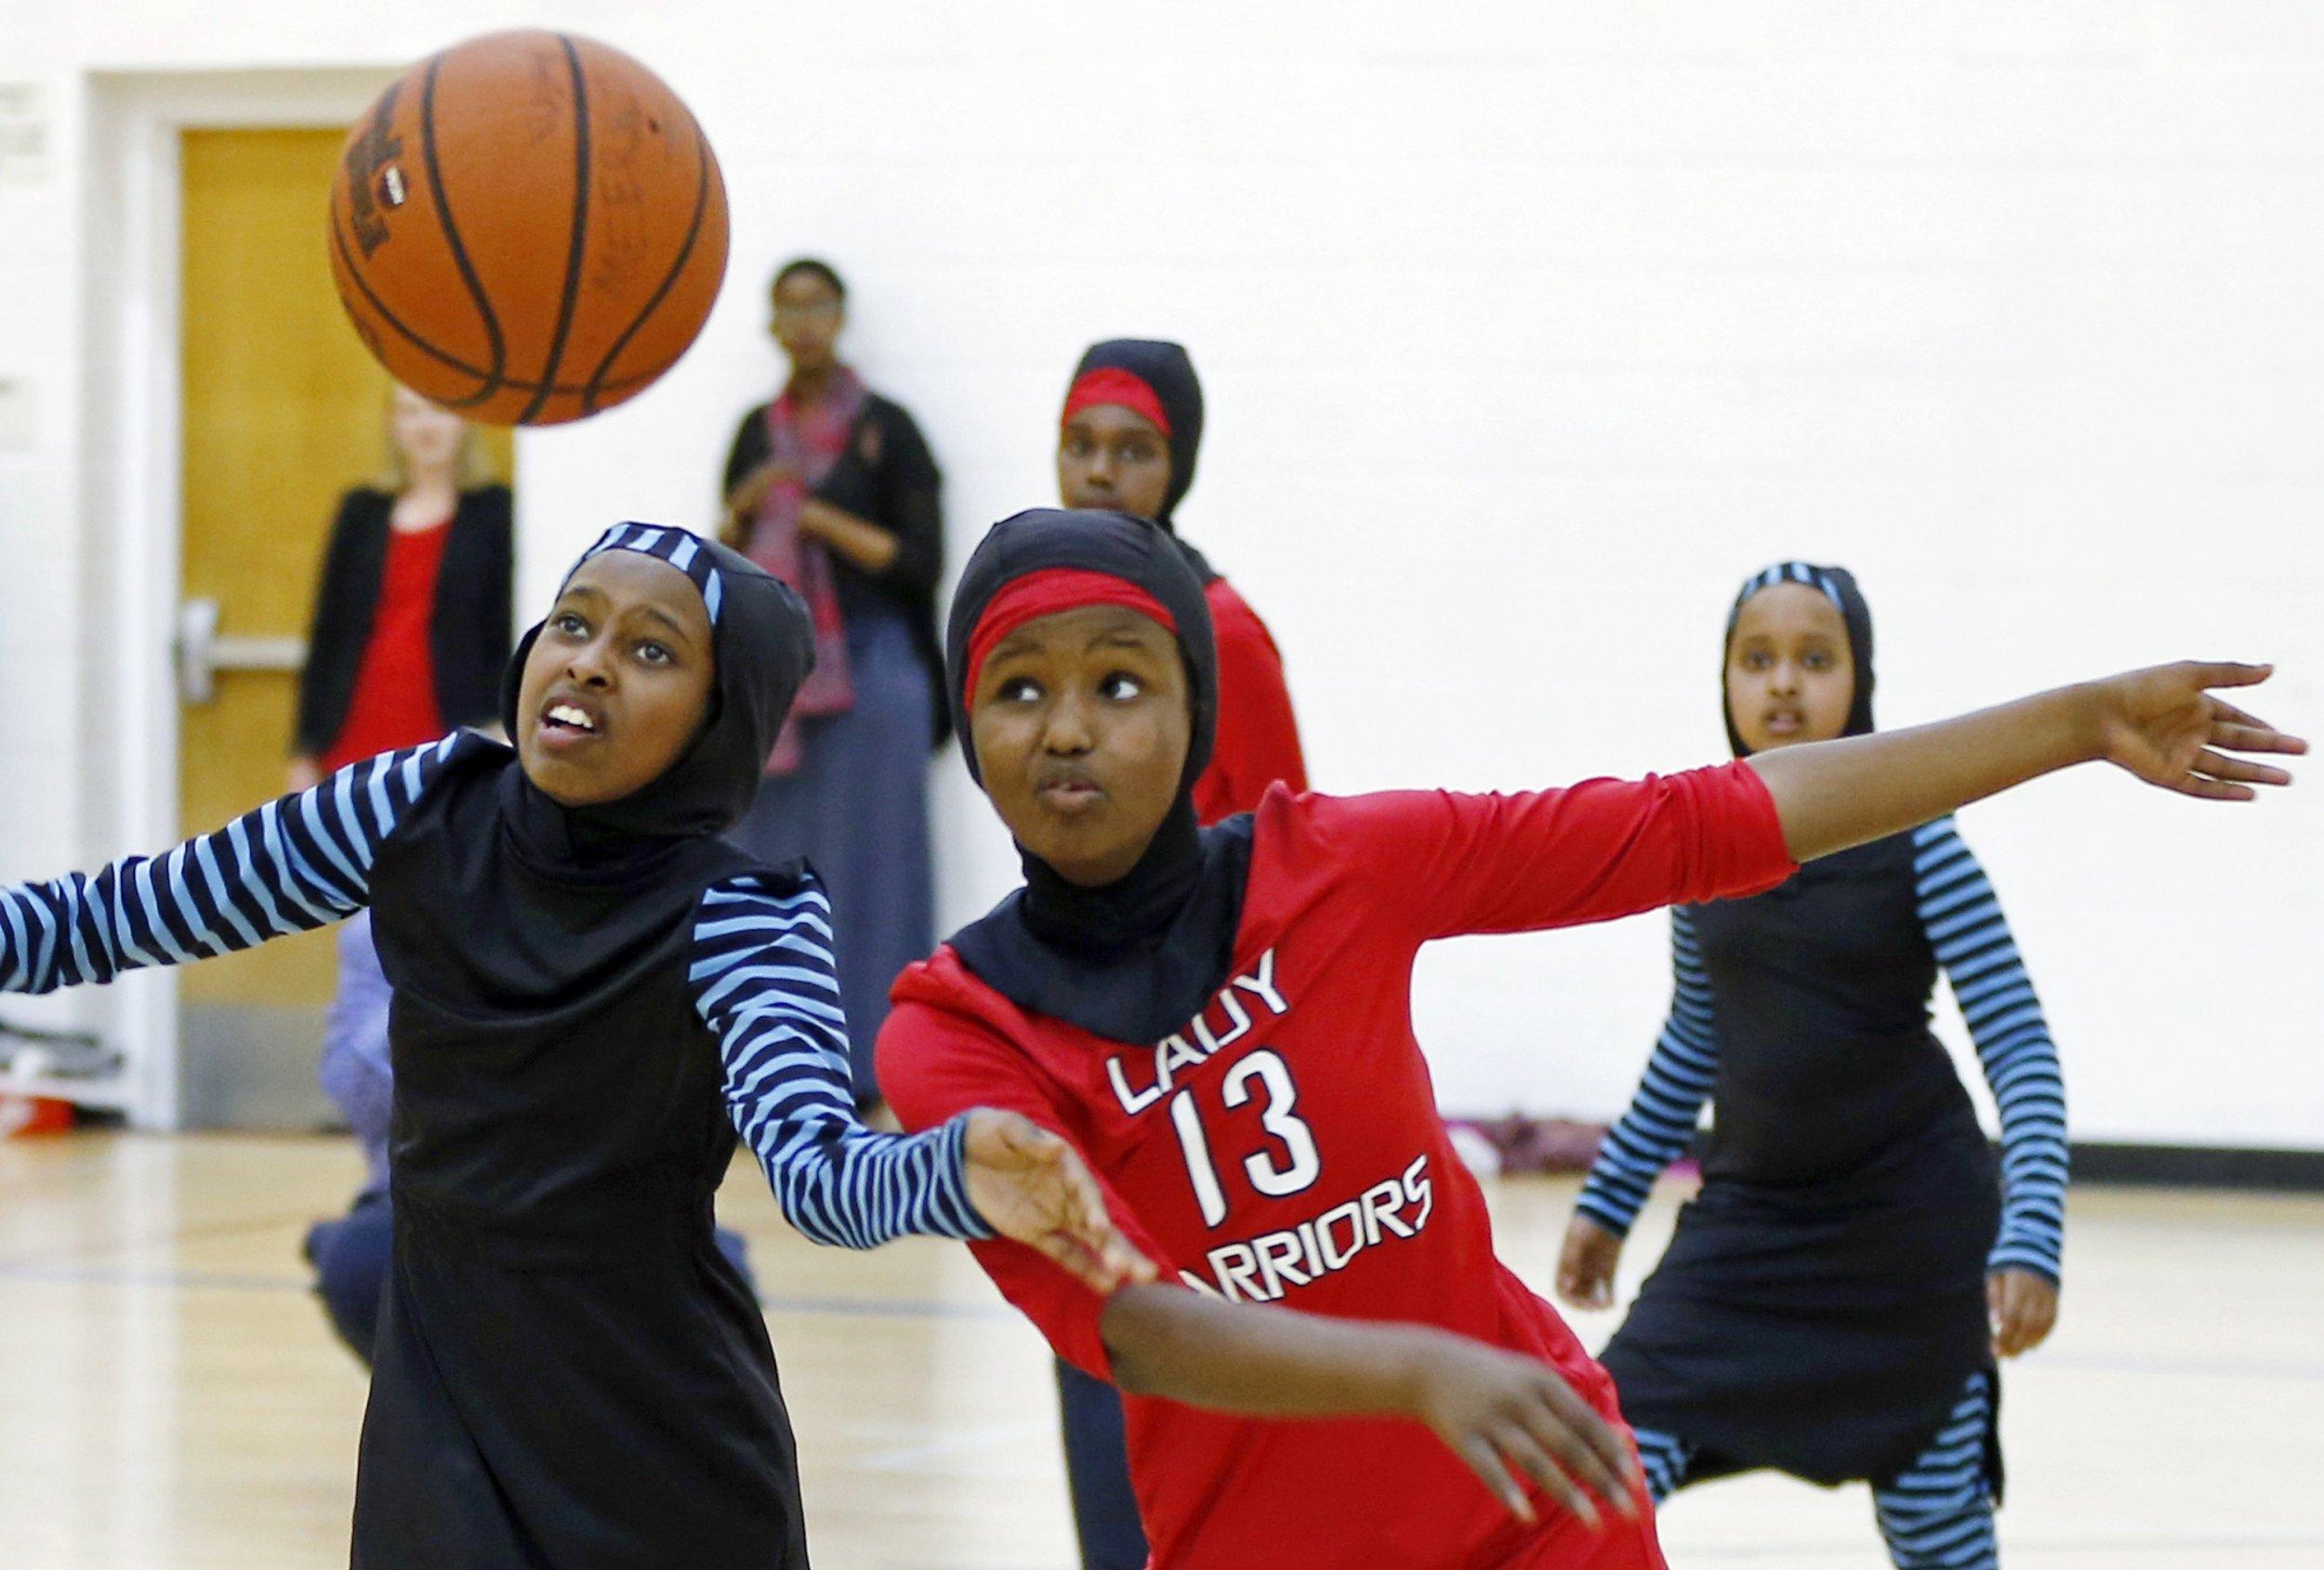 07_07_muslim_basketball_01